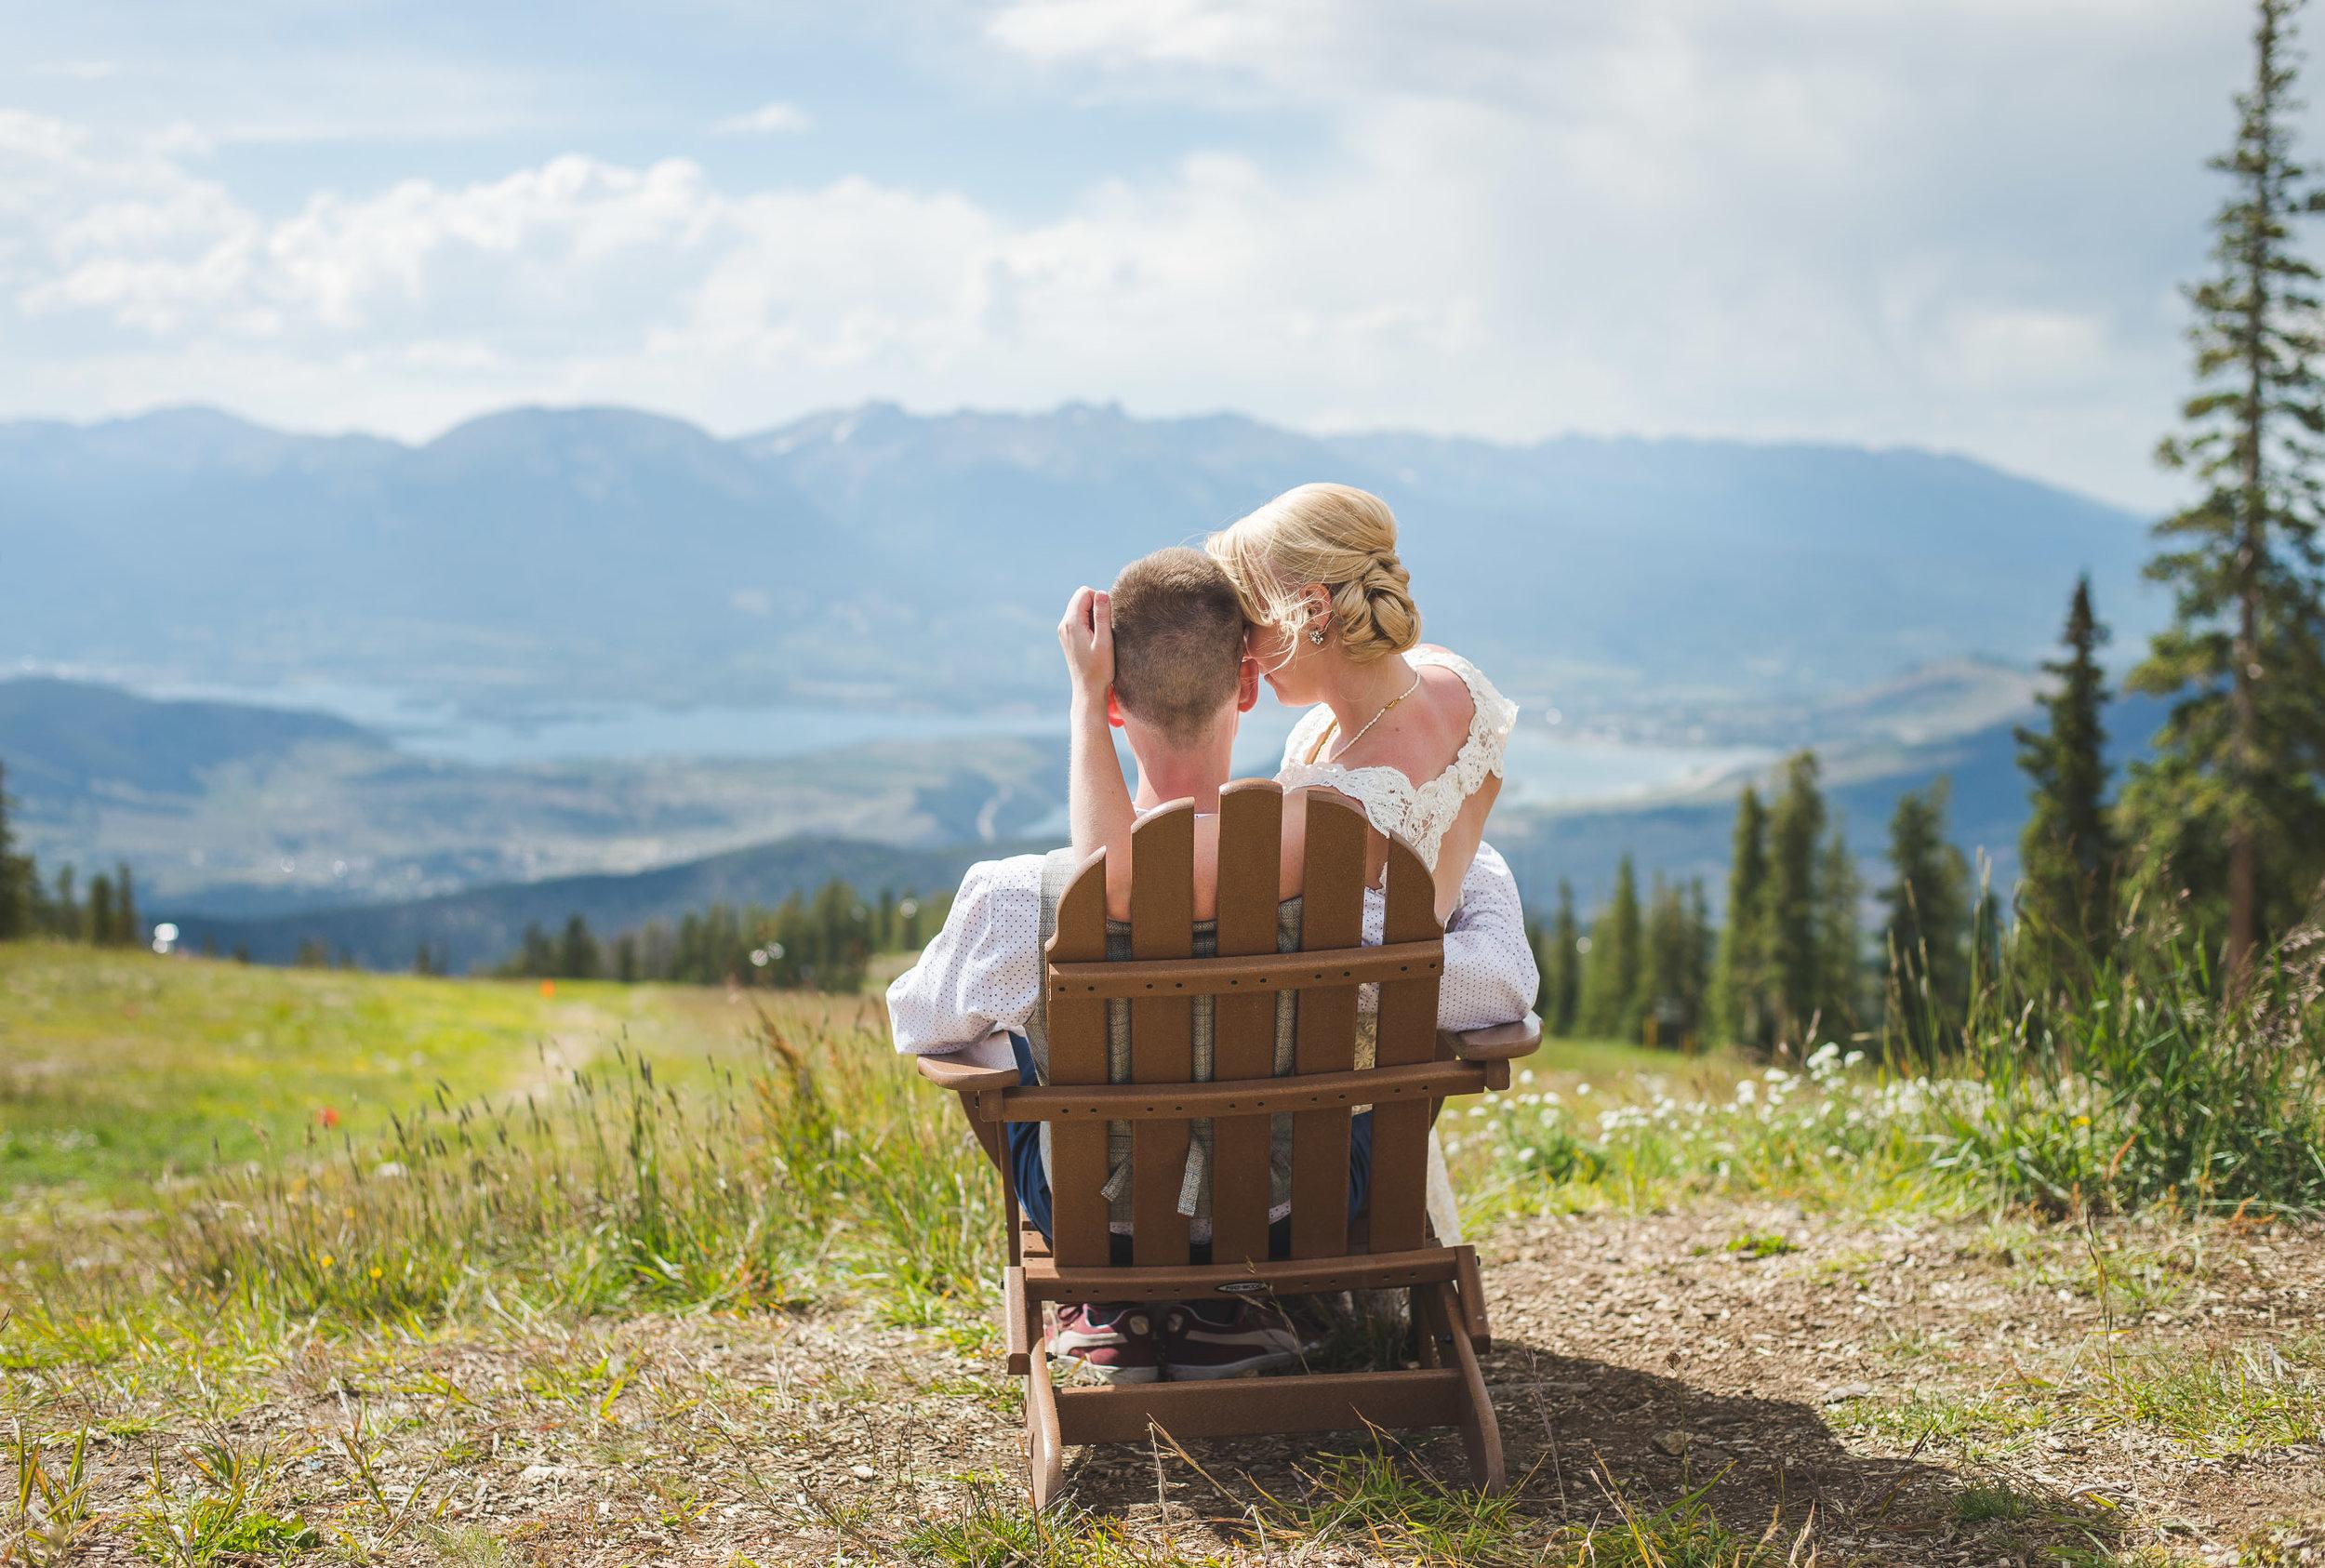 keystone bride and groom | summer wedding on schoolmarm in keystone, colorado | keeping composure photography